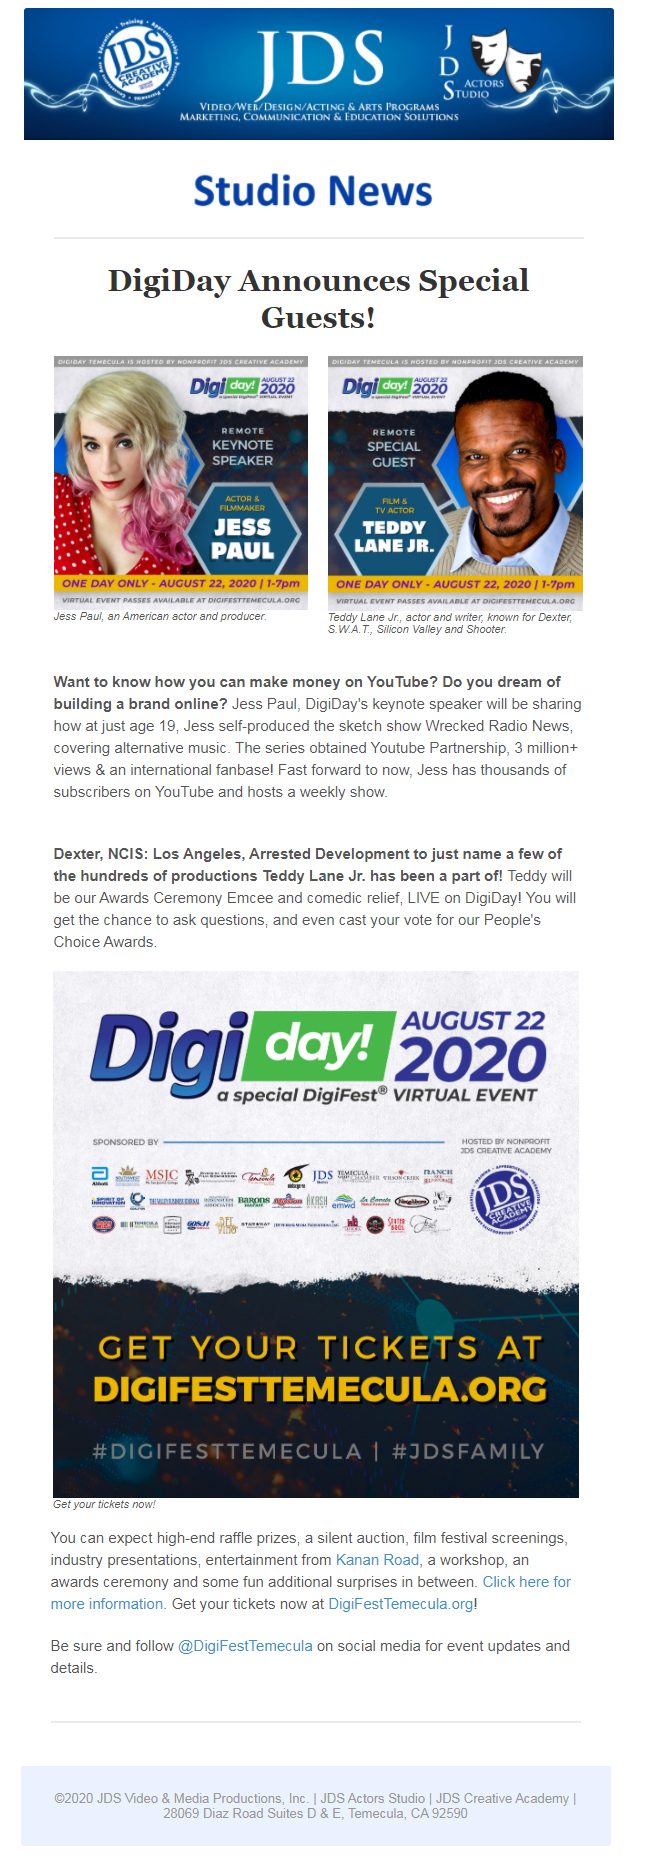 DigiDay 2020, Announces A-List Guests and Event Surprises